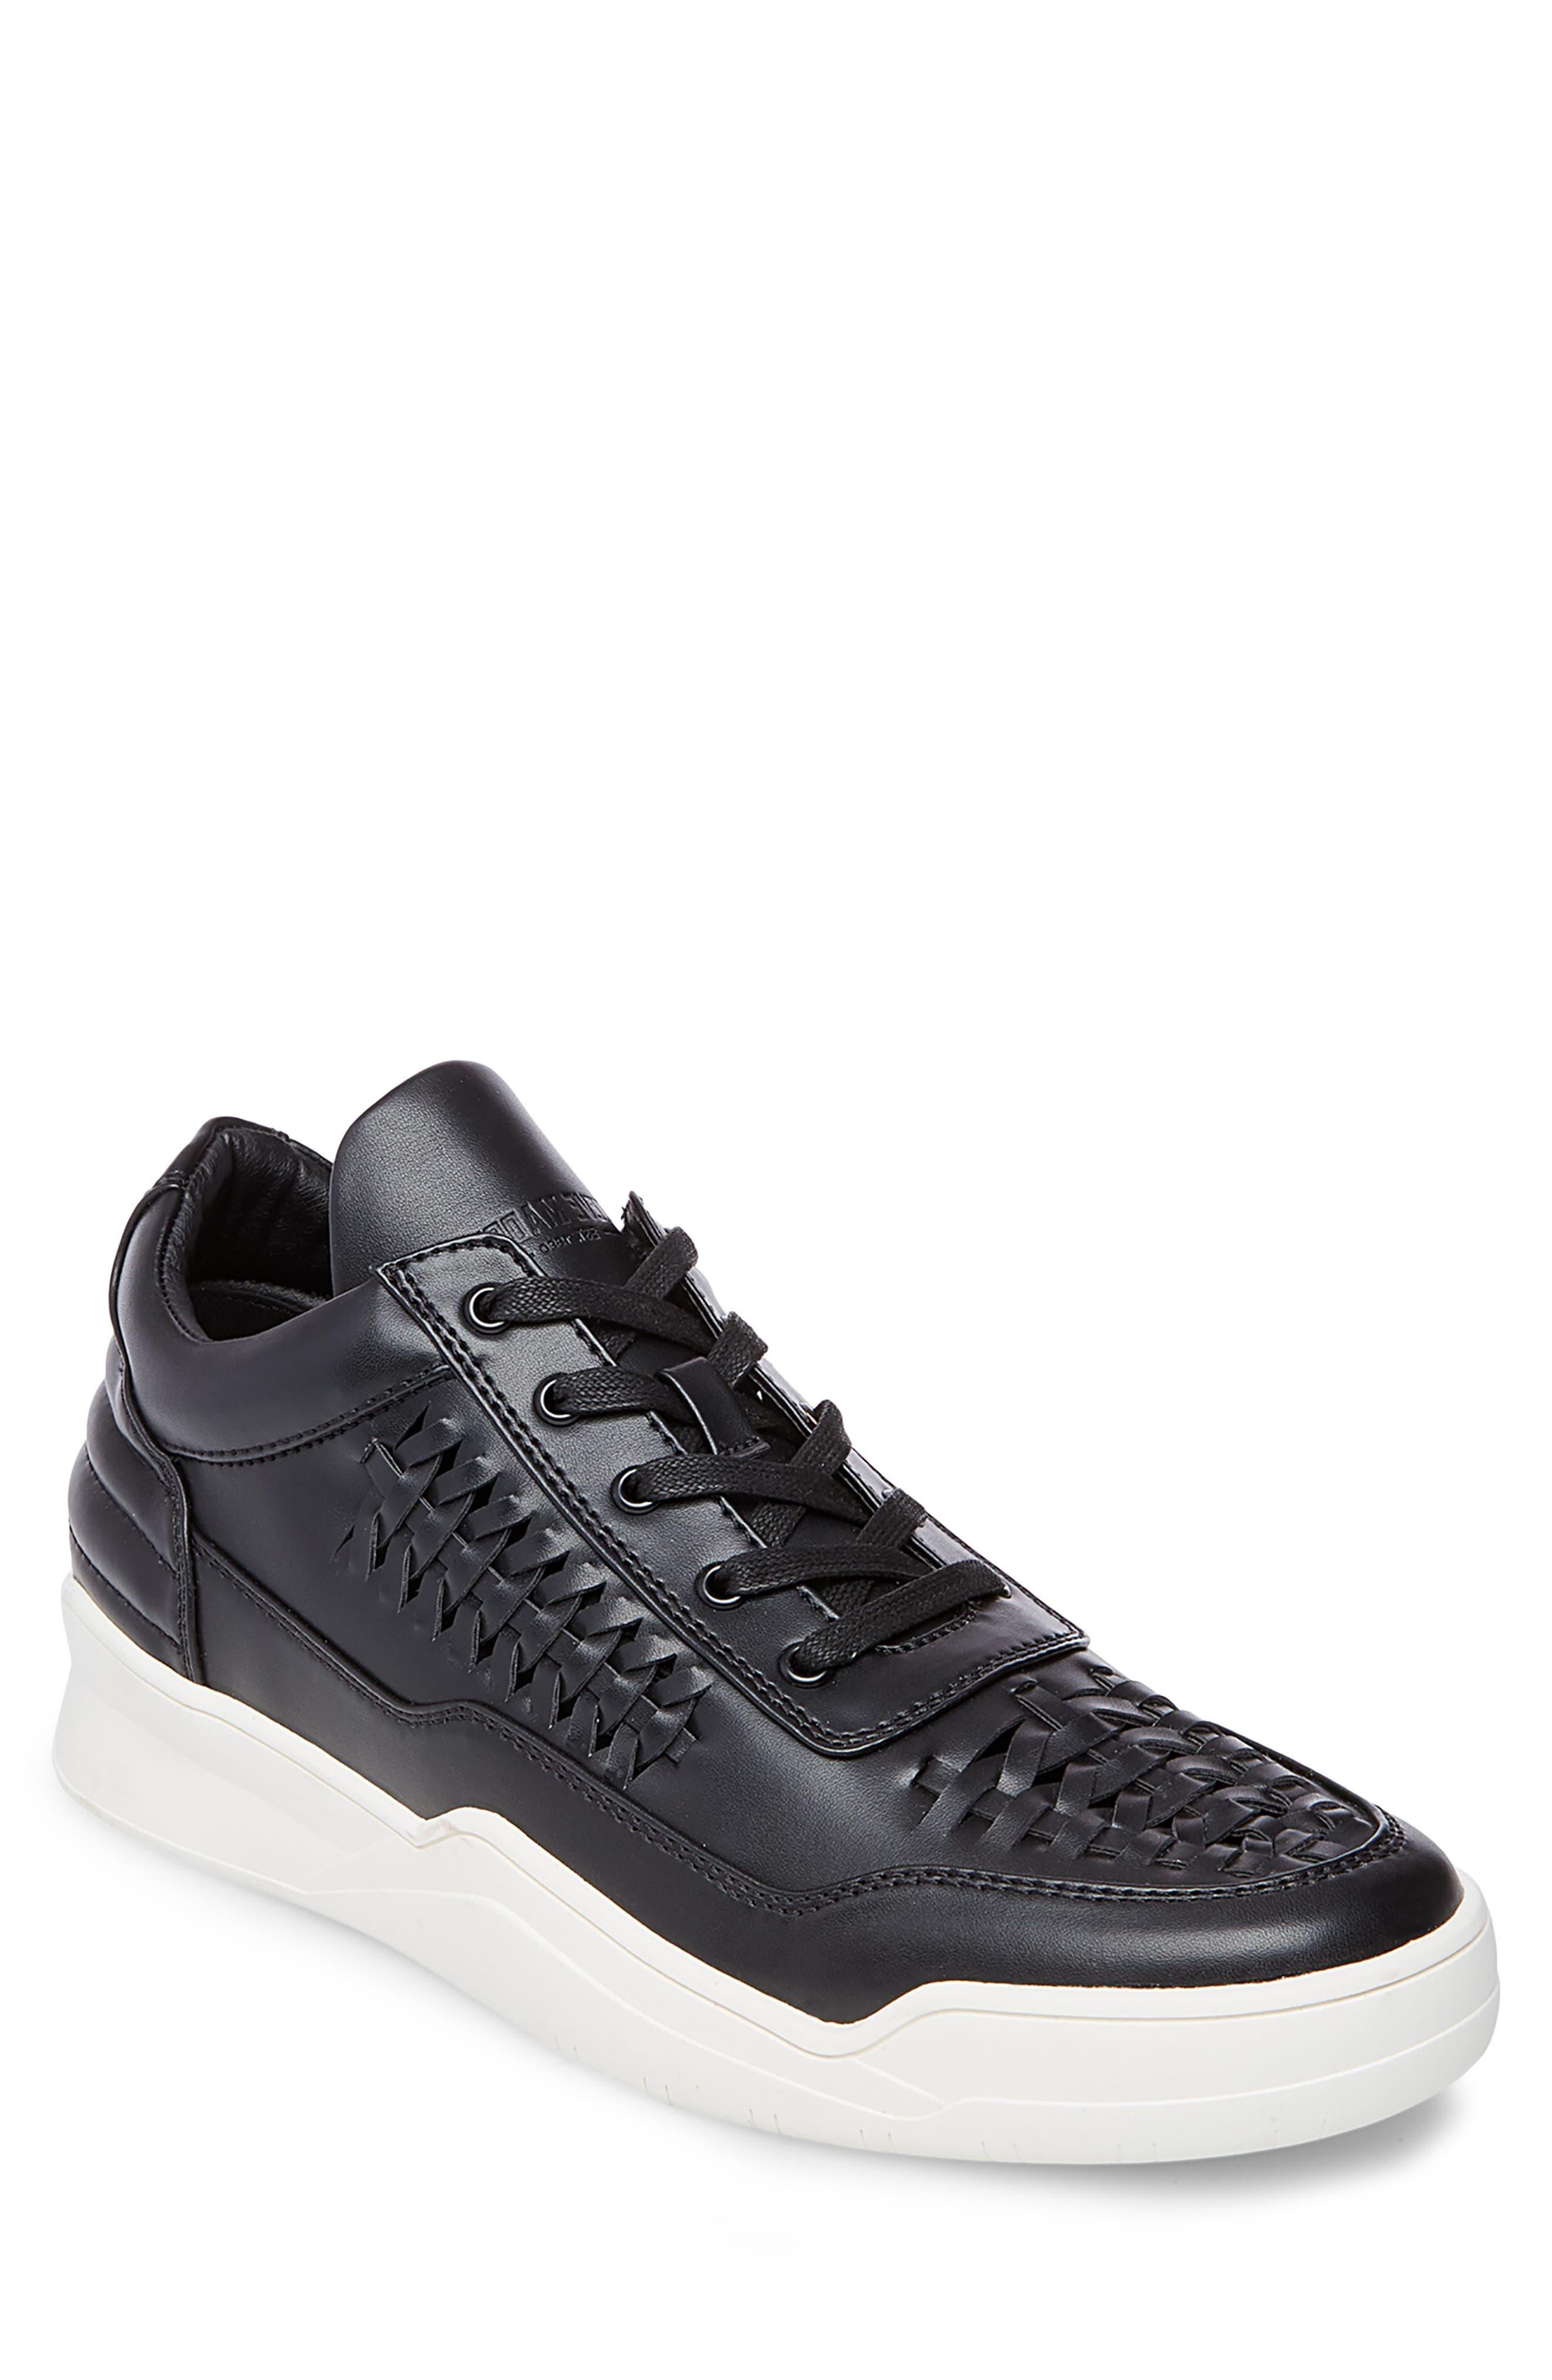 Valor Sneaker,                         Main,                         color, 001